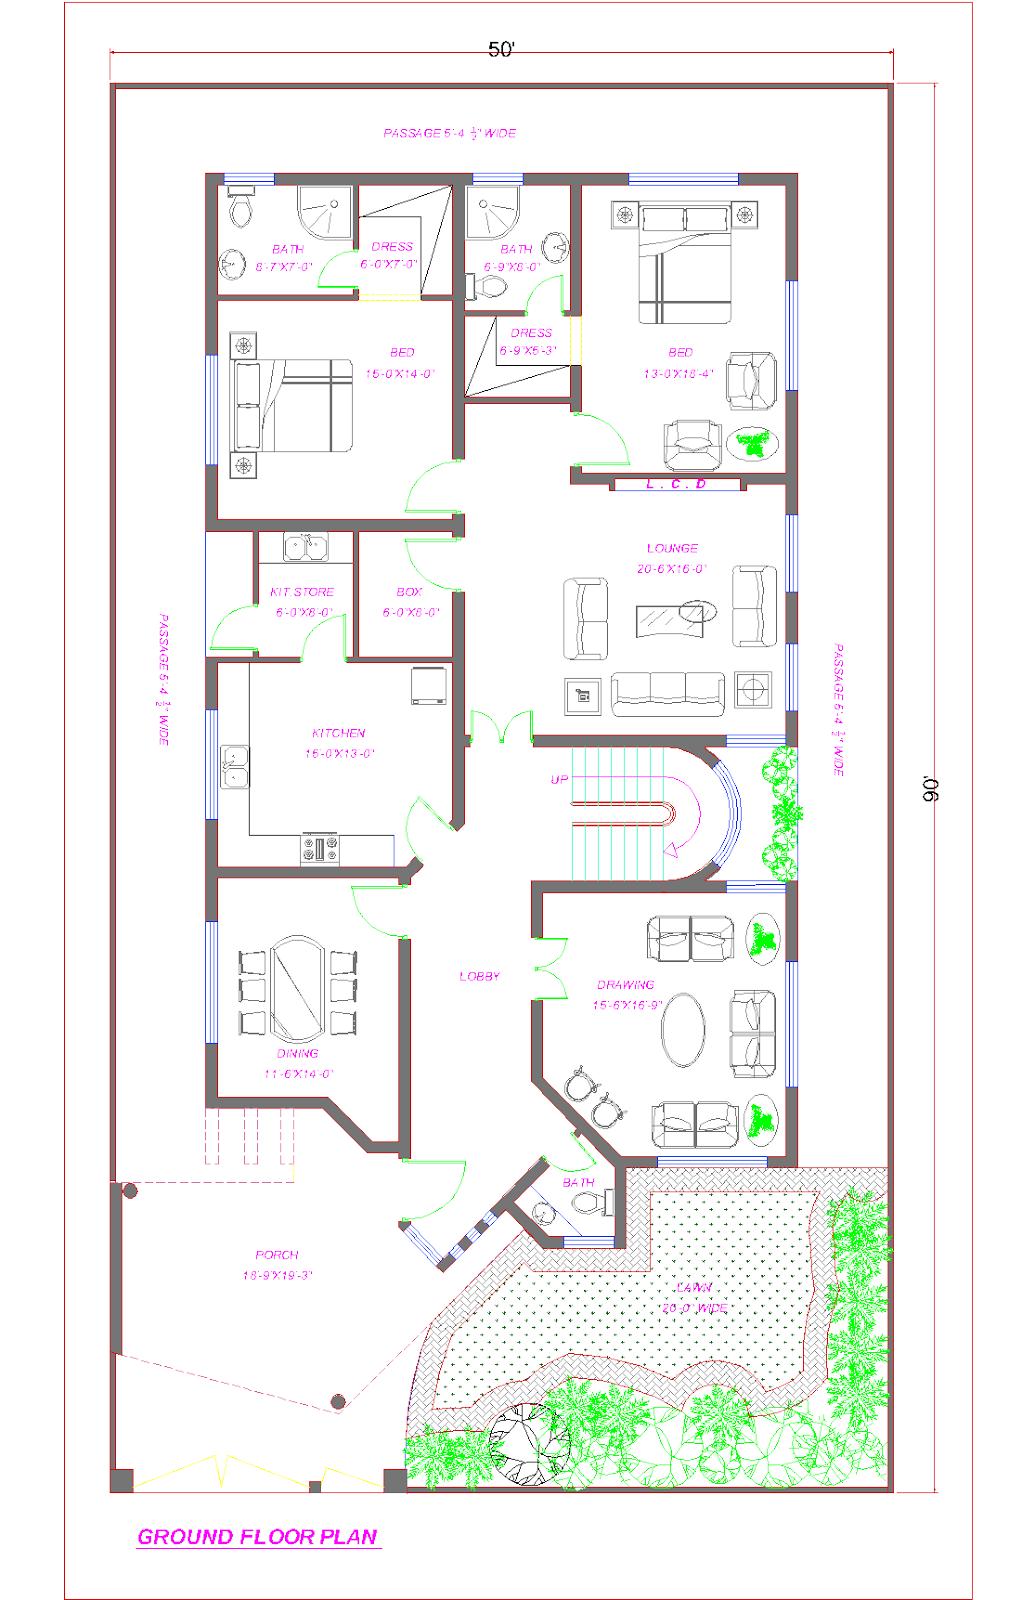 House Gates Pictures Pakistan Model House Plan House Layout Plans Home Design Plans